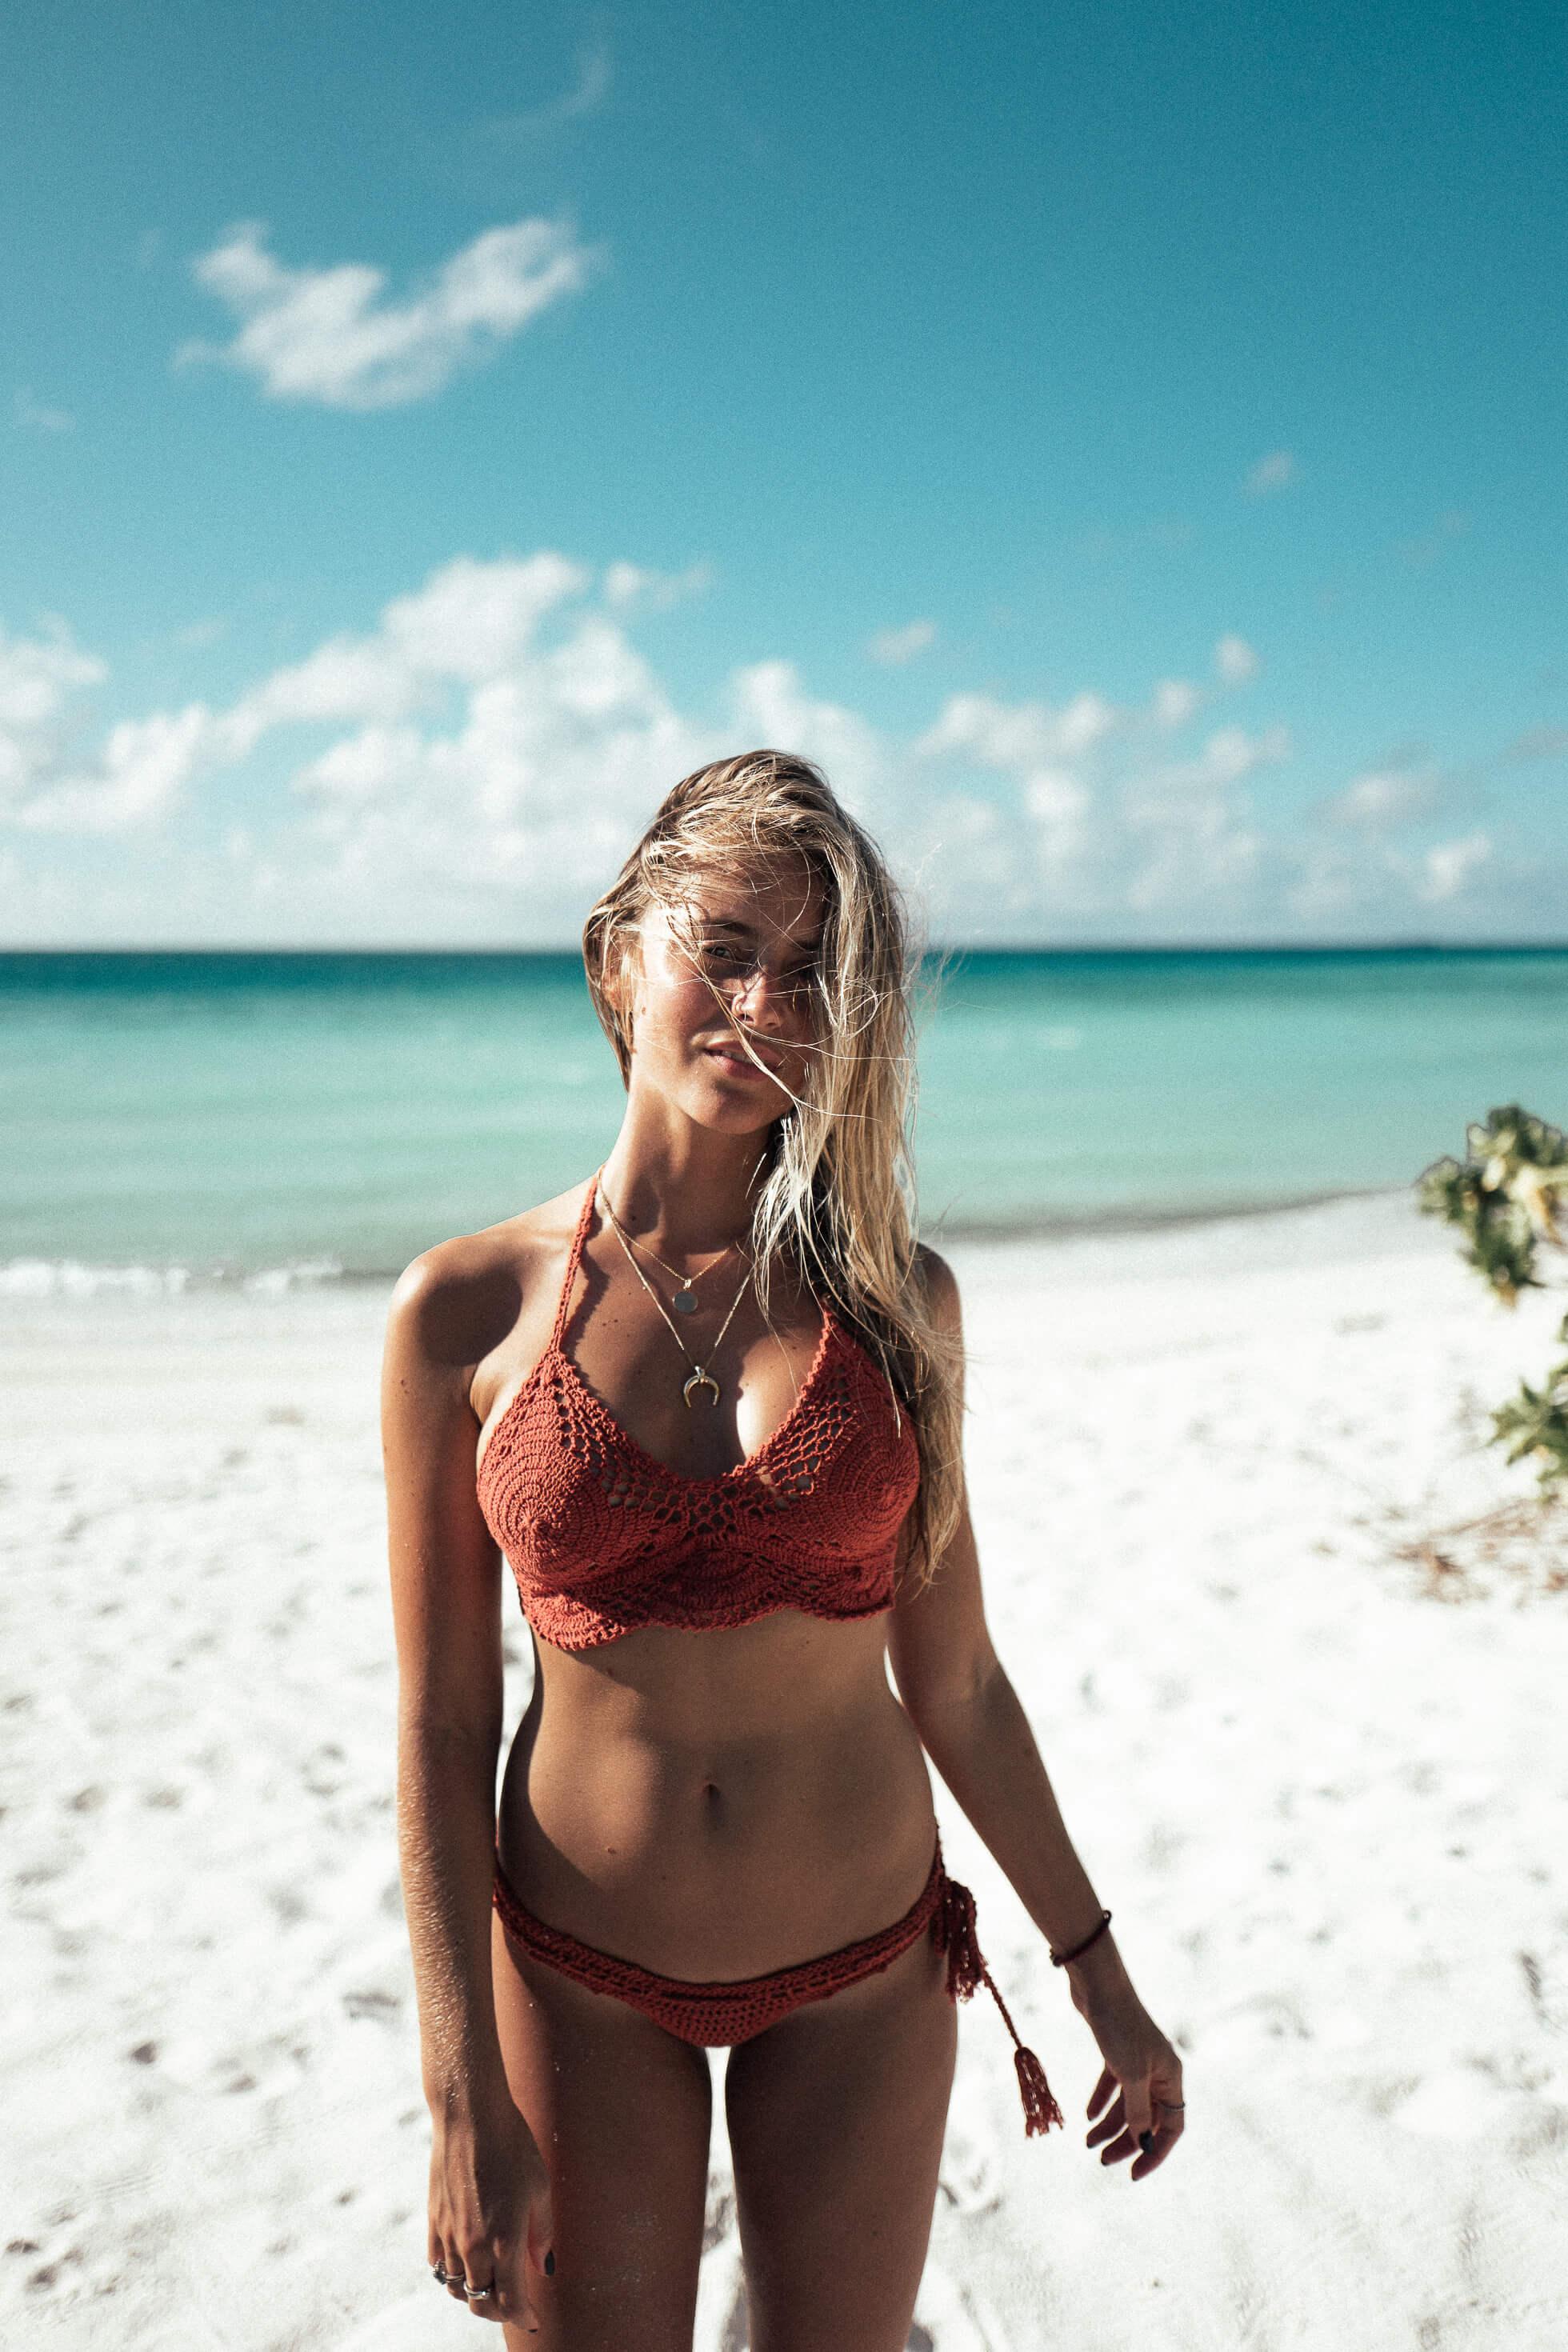 janni-deler-crochet-bikini-maldivesl1120729